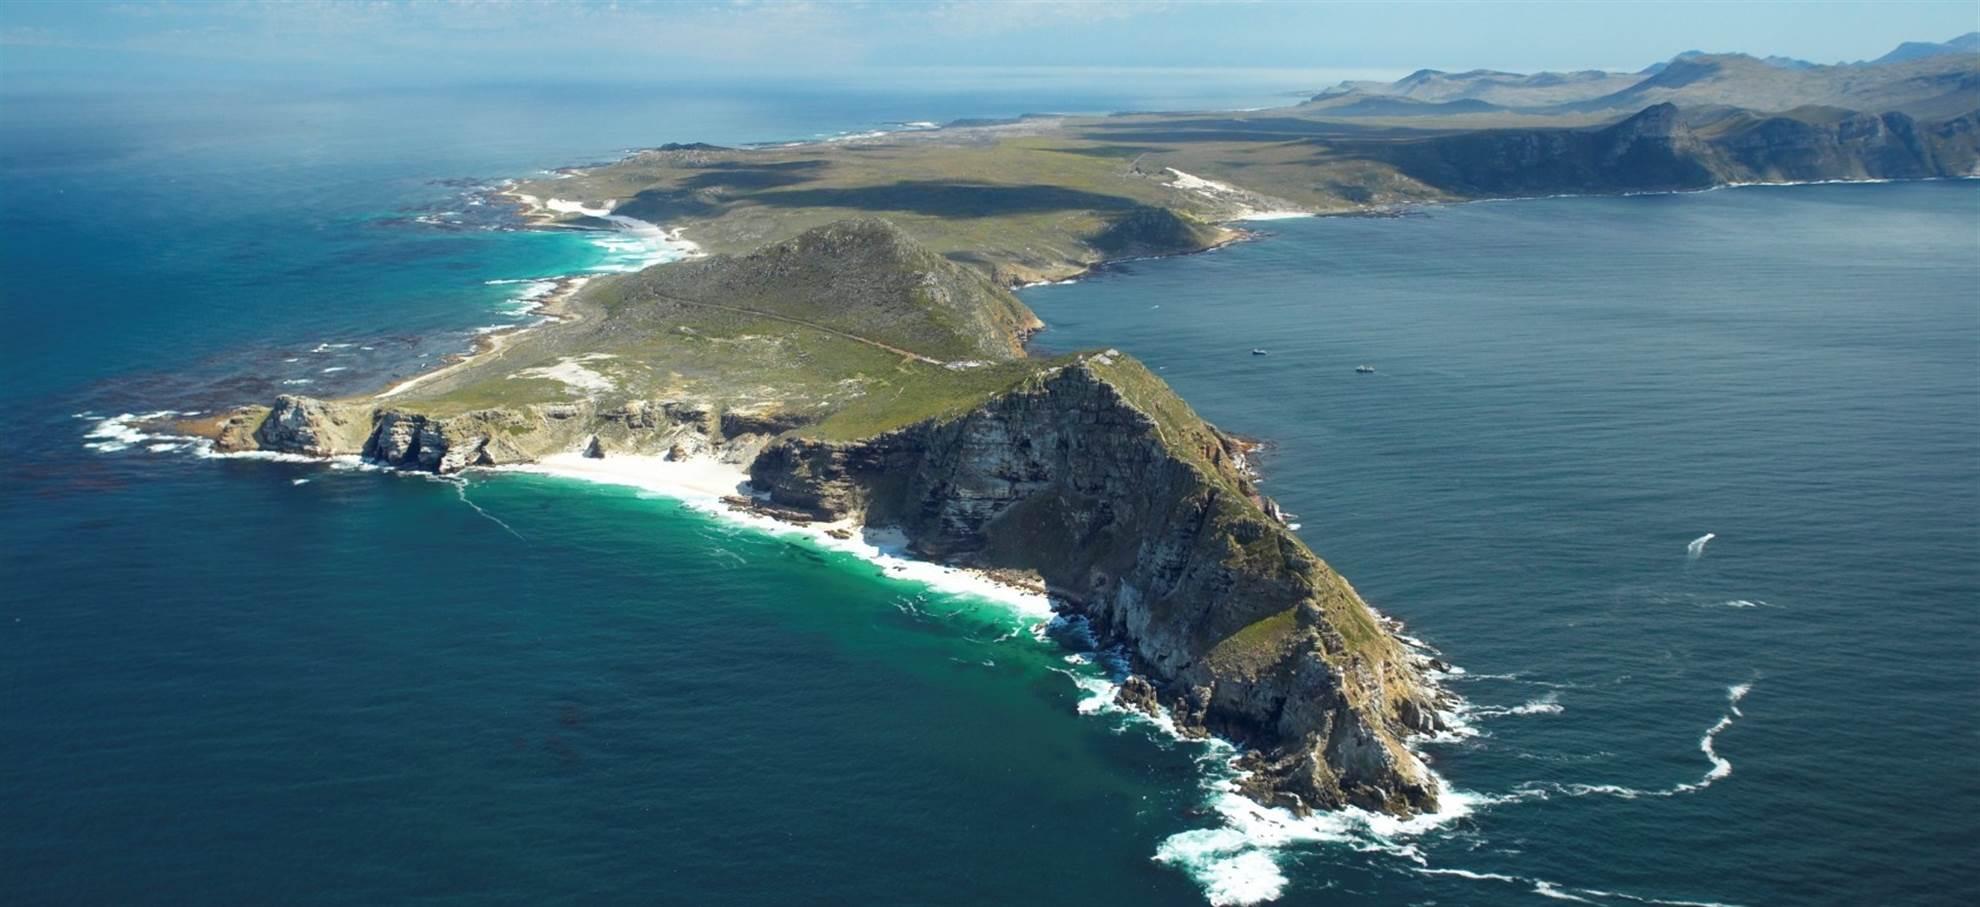 Dagtour Cape Peninsula